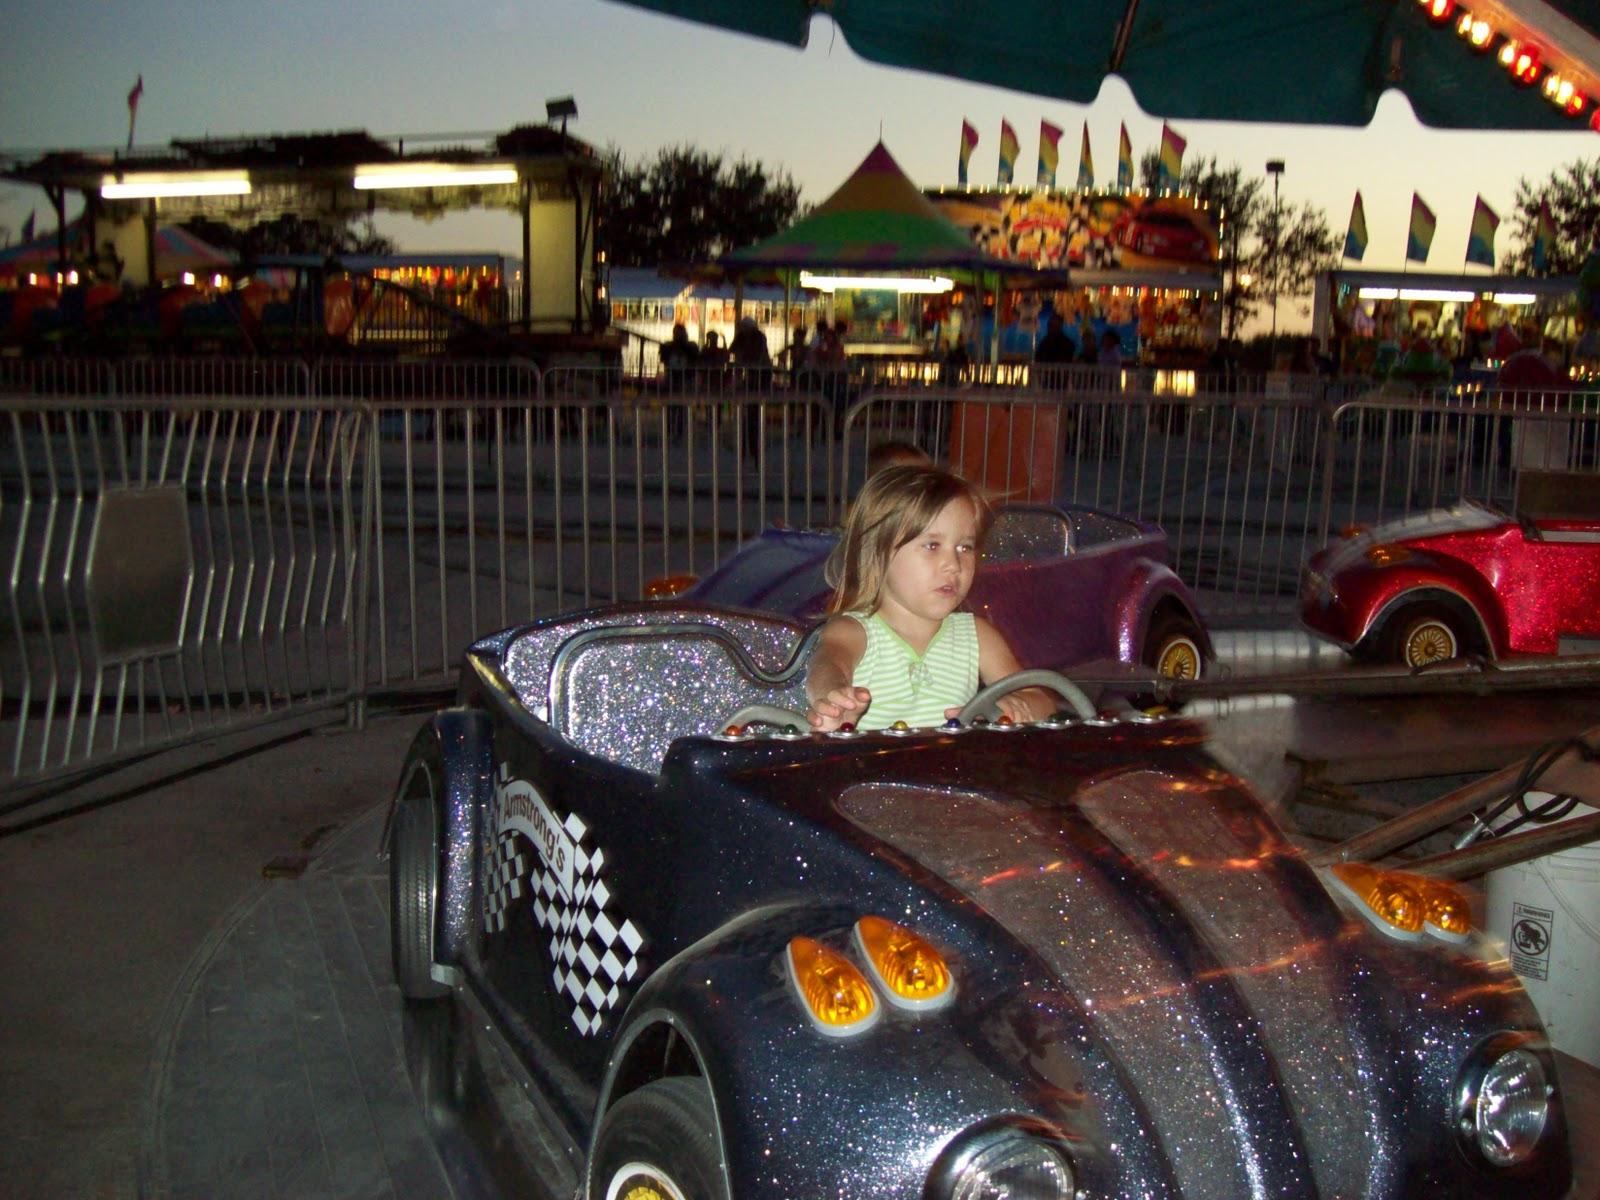 Fort Bend County Fair 2008 - 101_0447.JPG